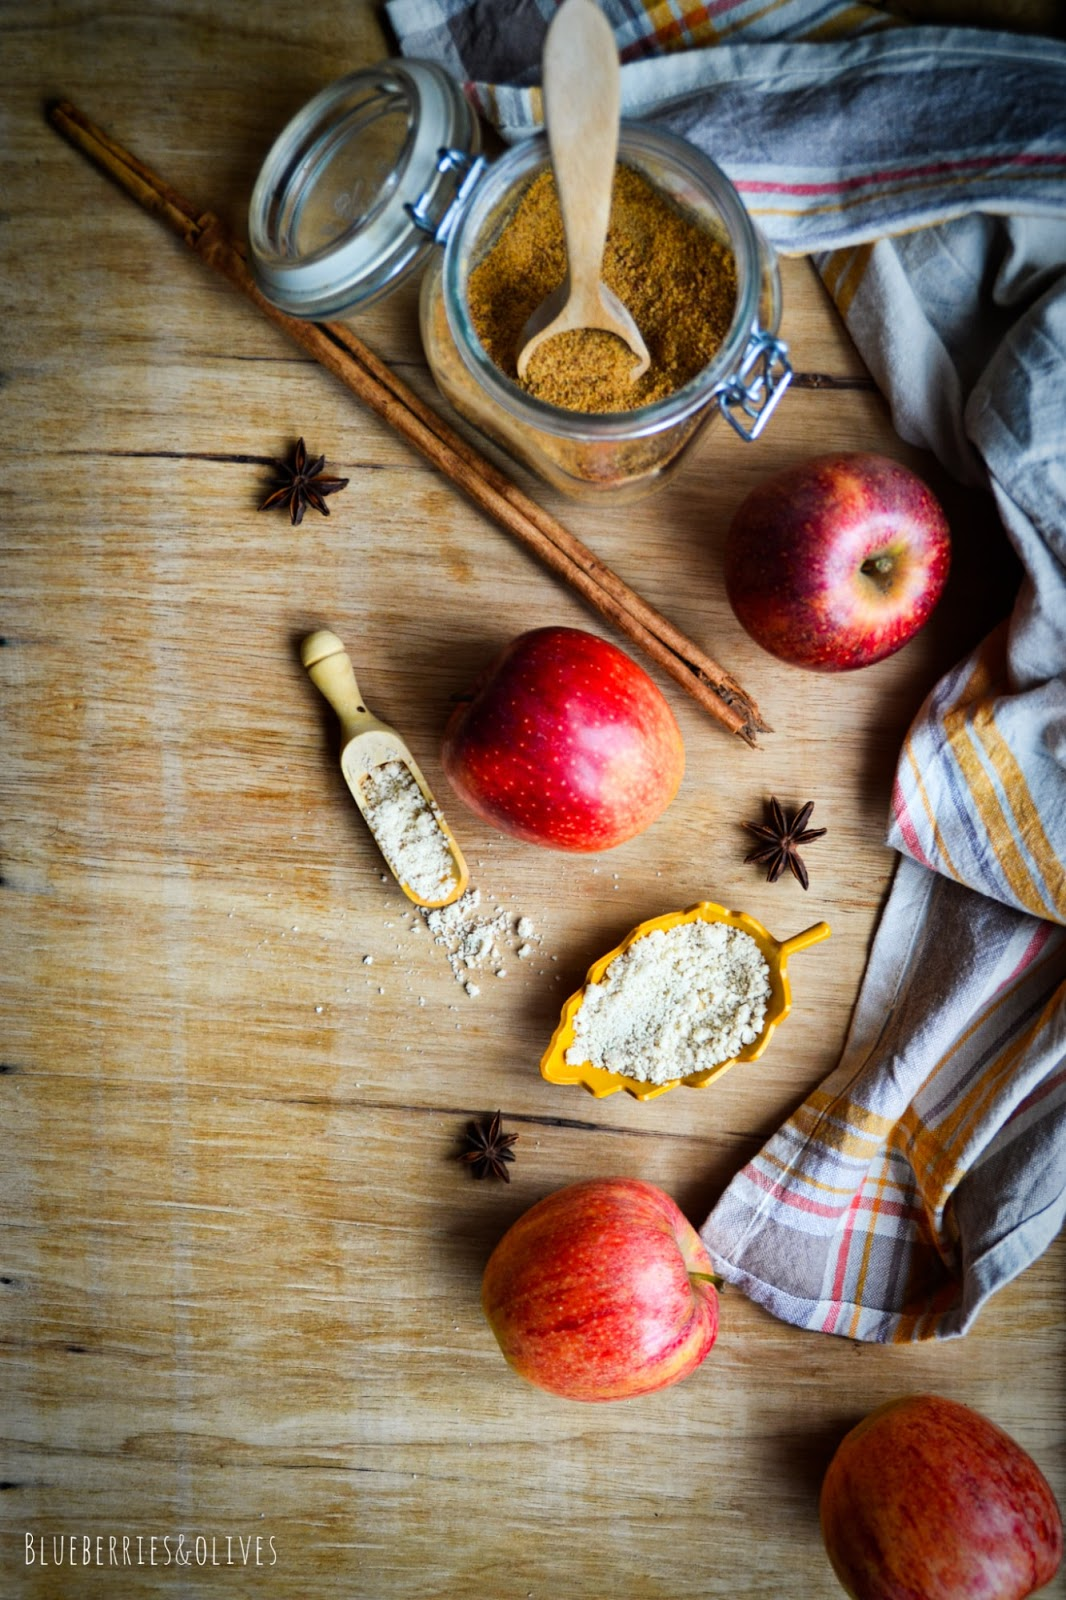 Cooking ingredients on wood table: red apples, brown sugar, star anise, cinnamon sticks